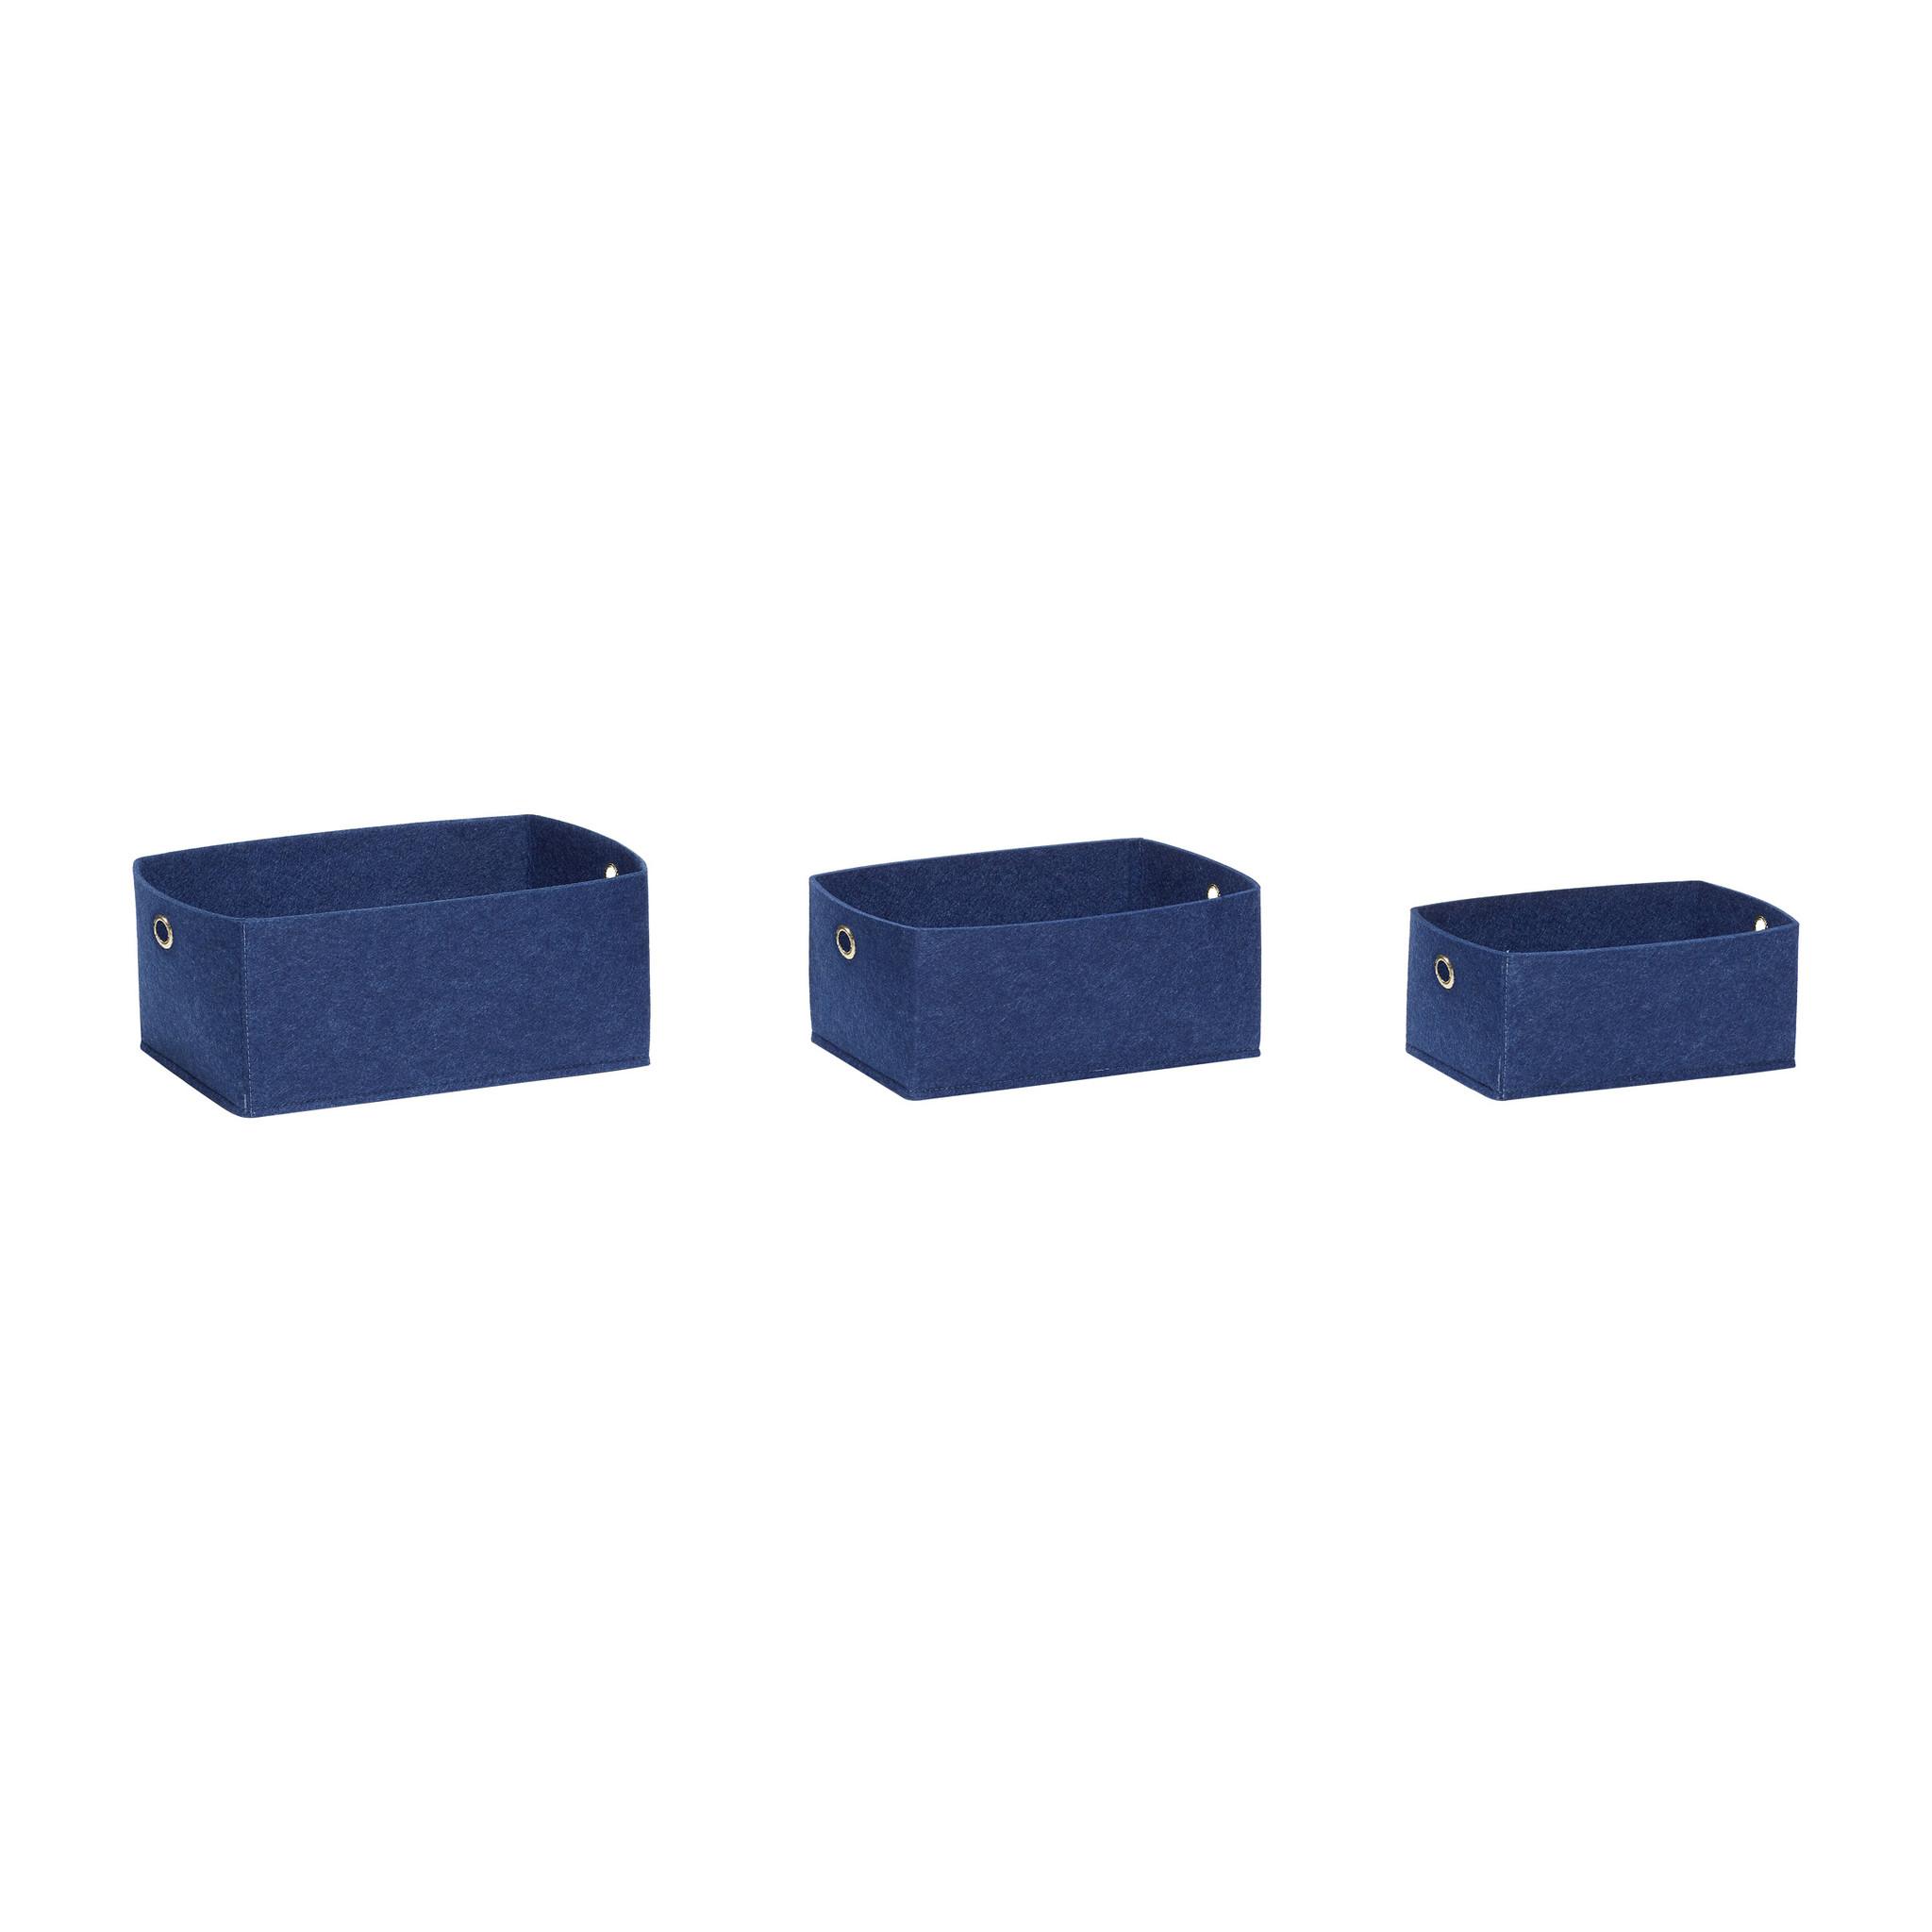 Hubsch Viltmand, blauw, vierkant, set van 3-680604-5712772064542